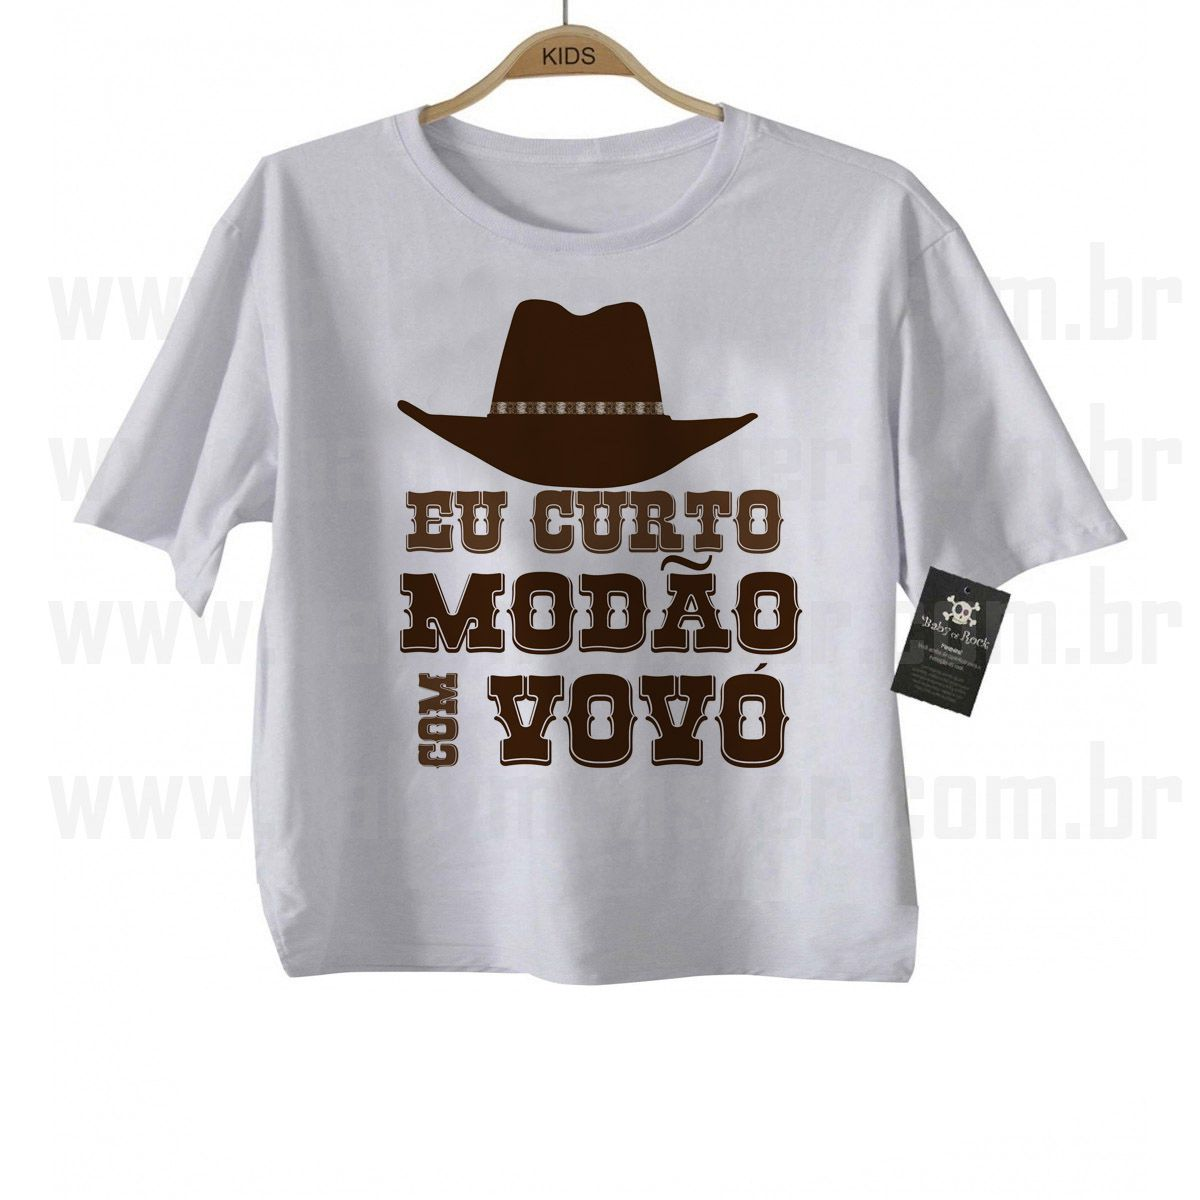 Camiseta Sertanejo Curto Modão com a Vovó- White  - Baby Monster S/A